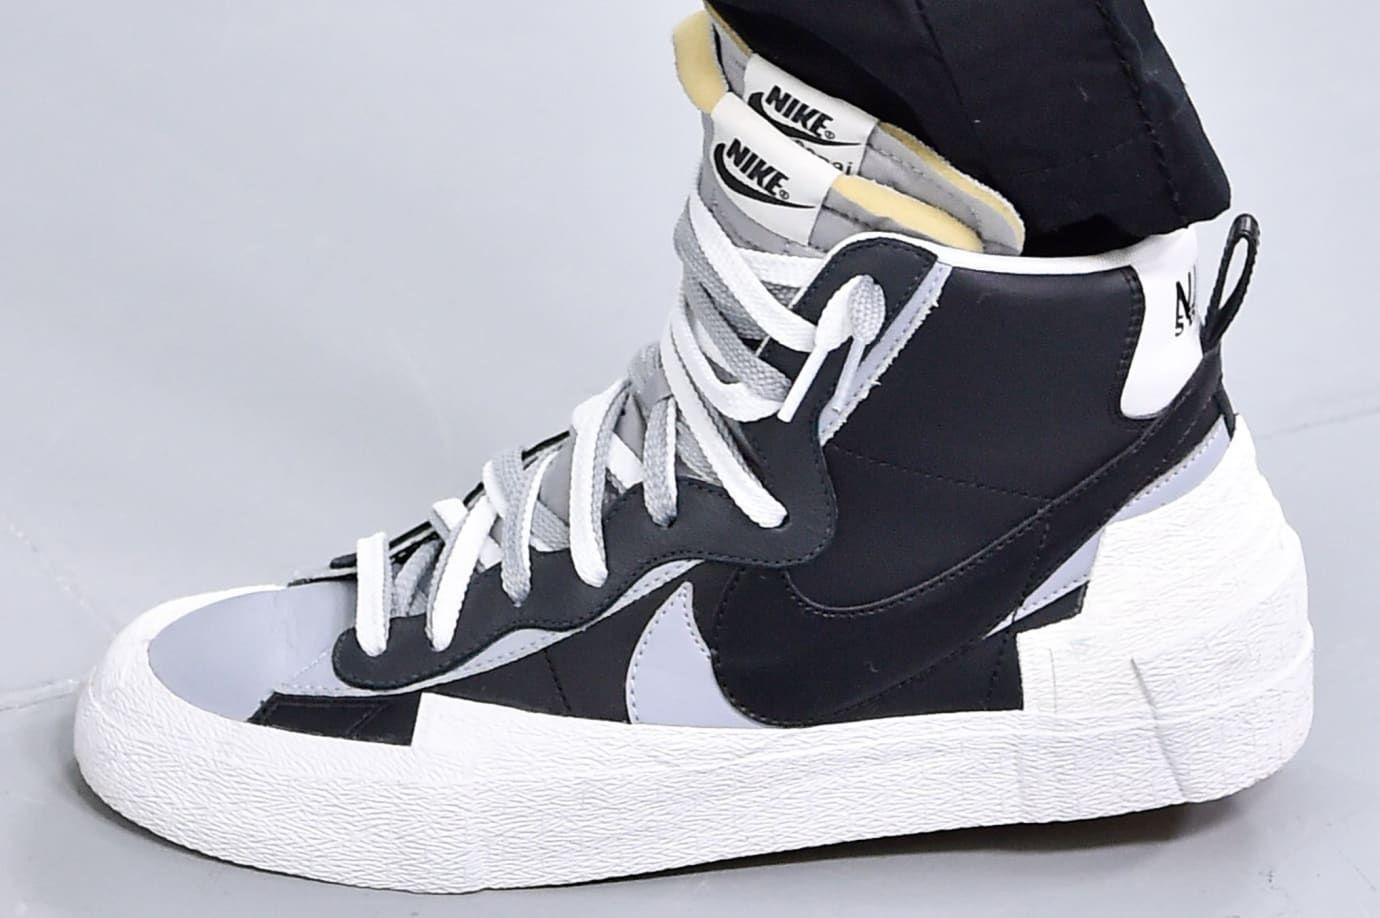 sacai-nike-hybrid-dunk-blazer-black